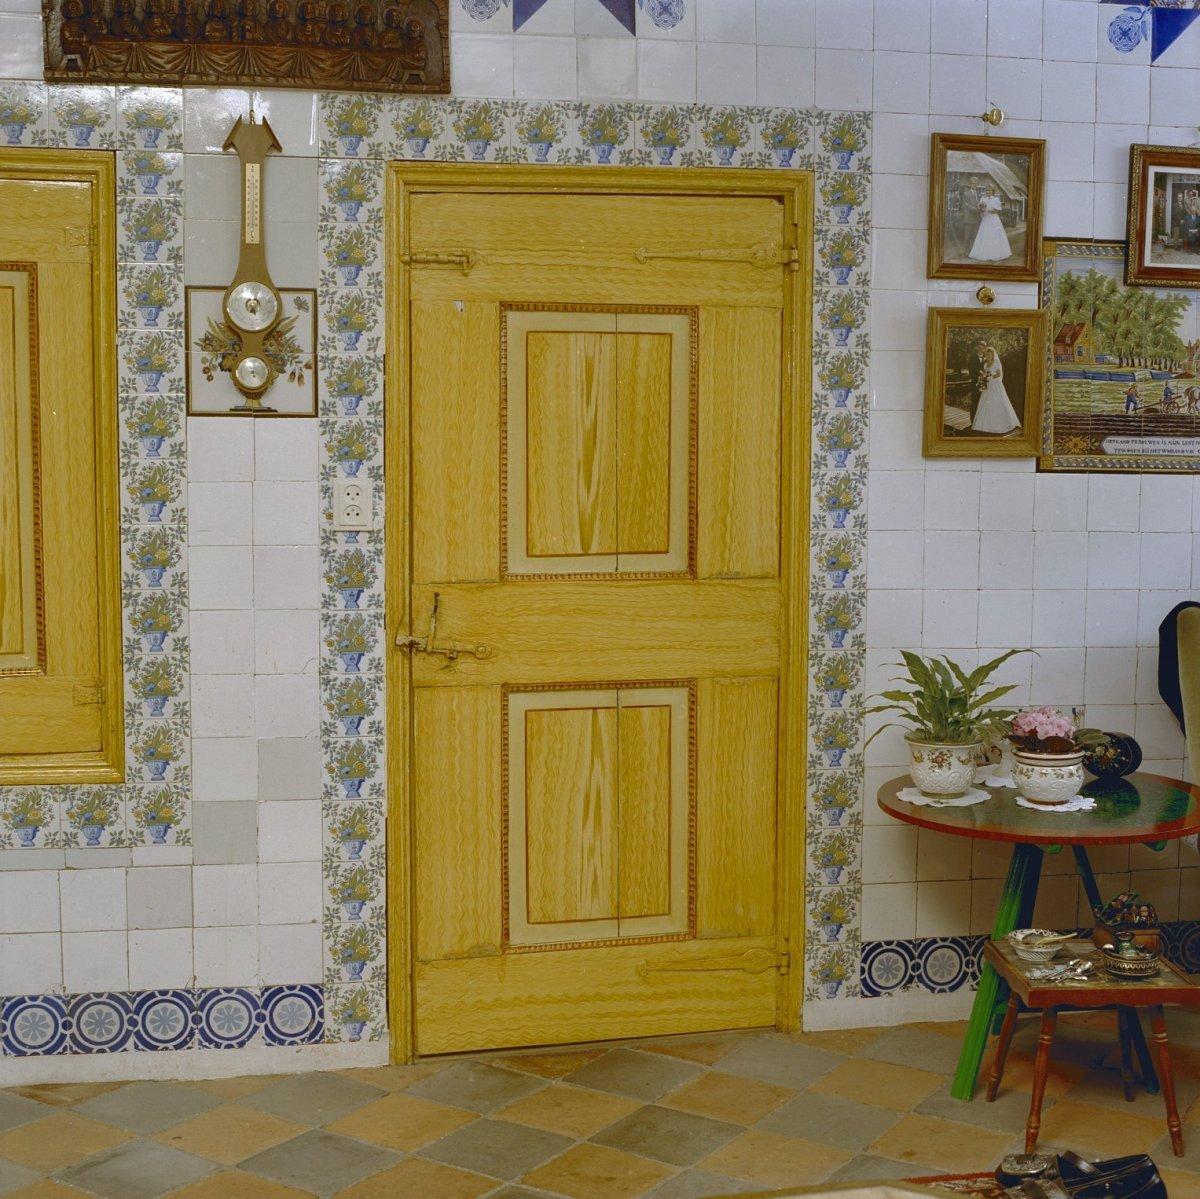 File:Interieur, woonkamer beschilderde deur (achterzijde is rood ...